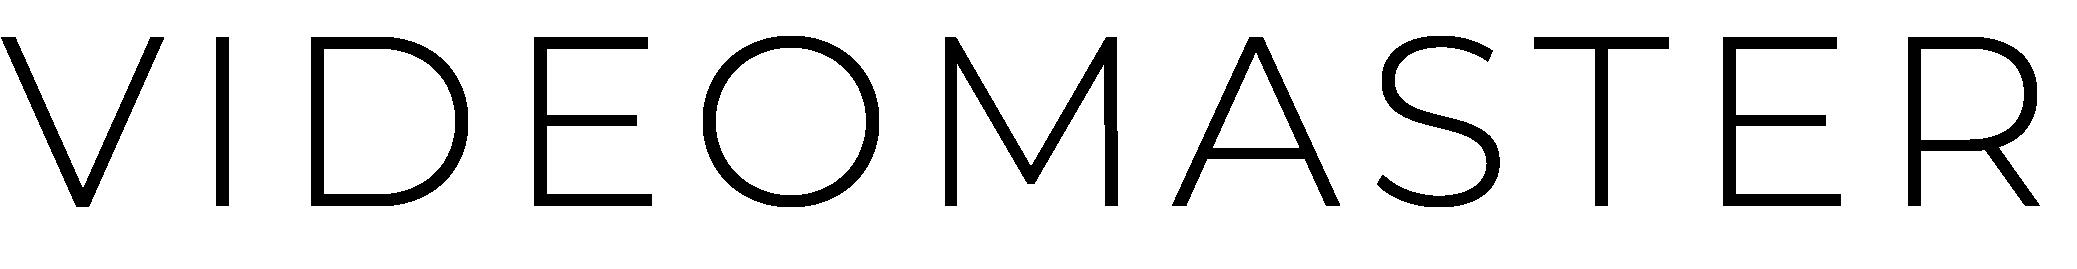 videomaster_logo@4x